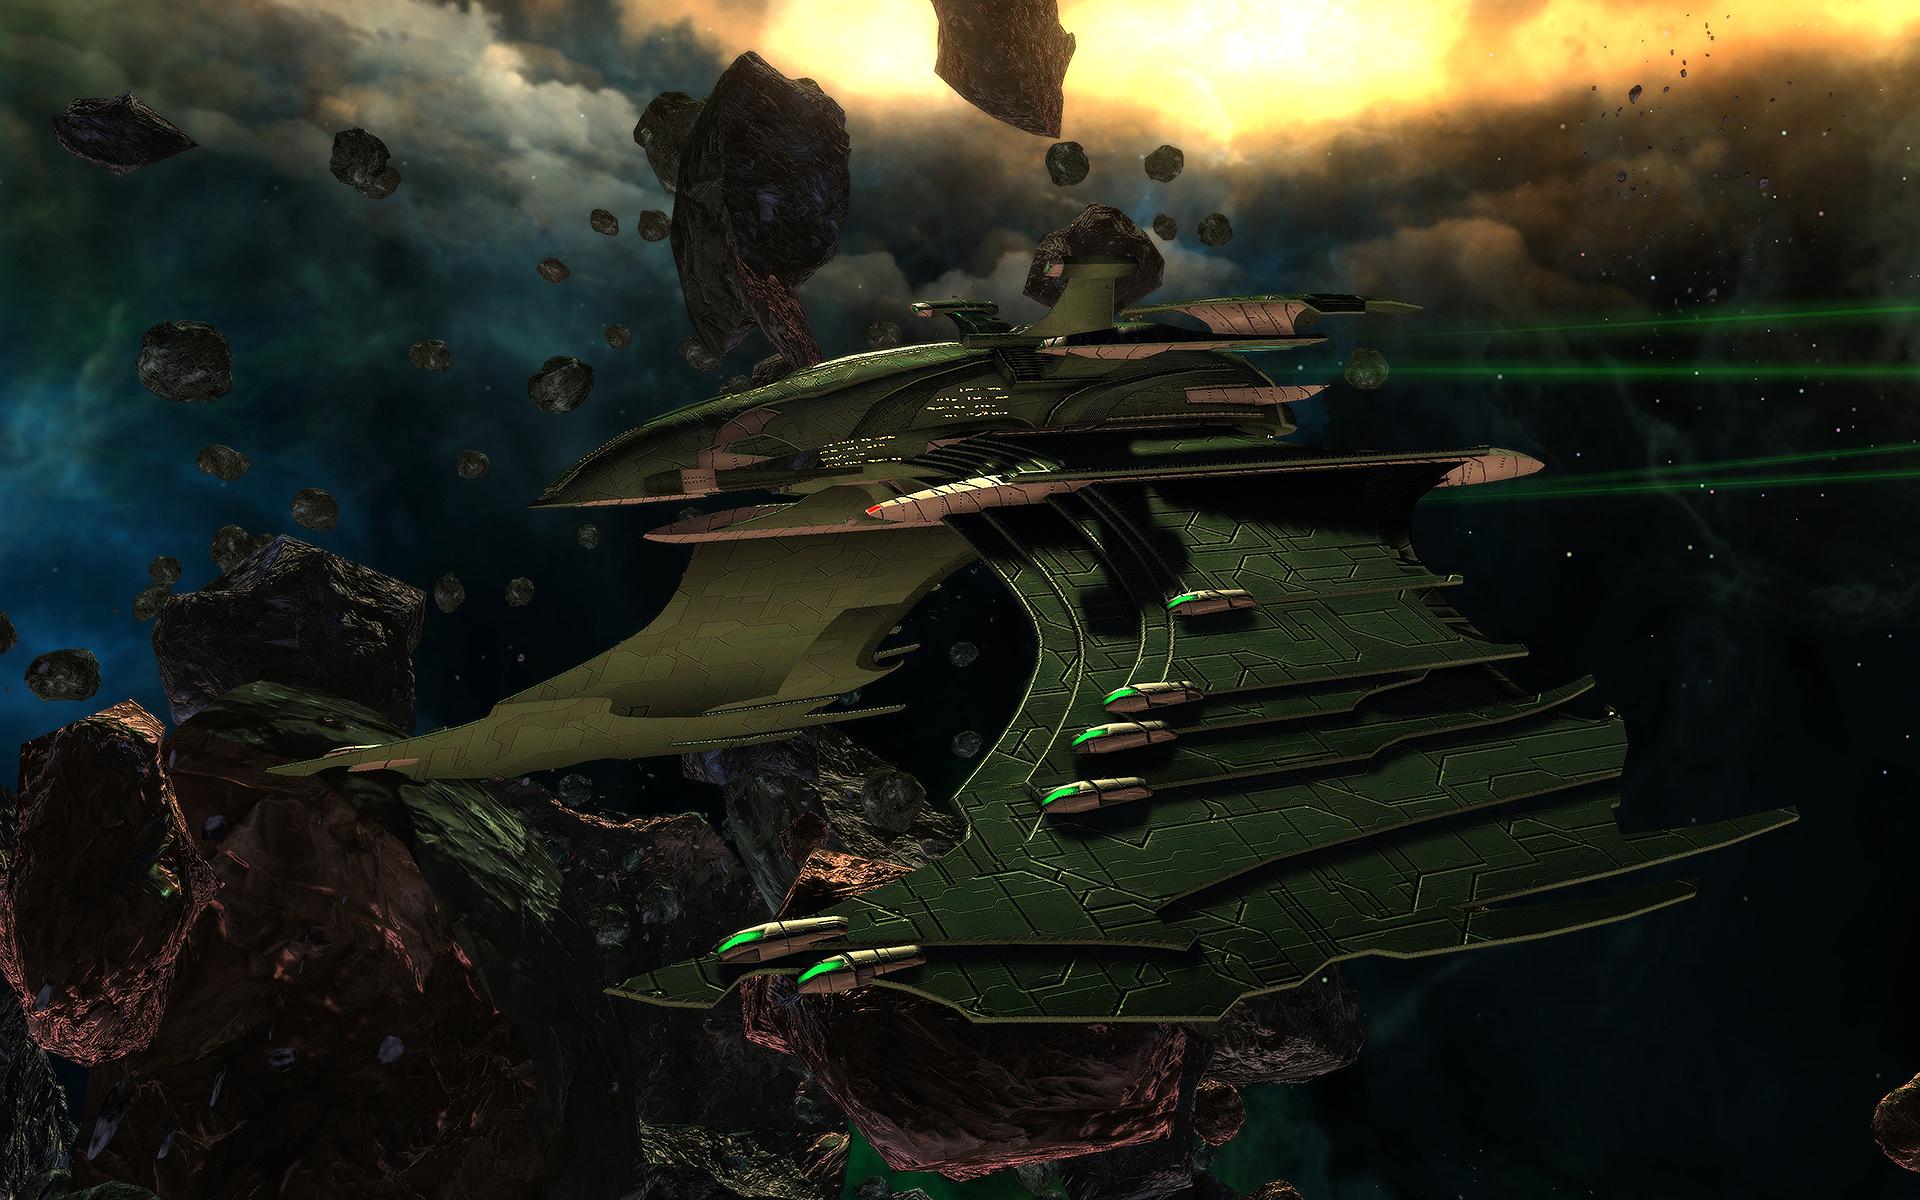 Werte der romulanischen Flaggschiffe   Star Trek Online